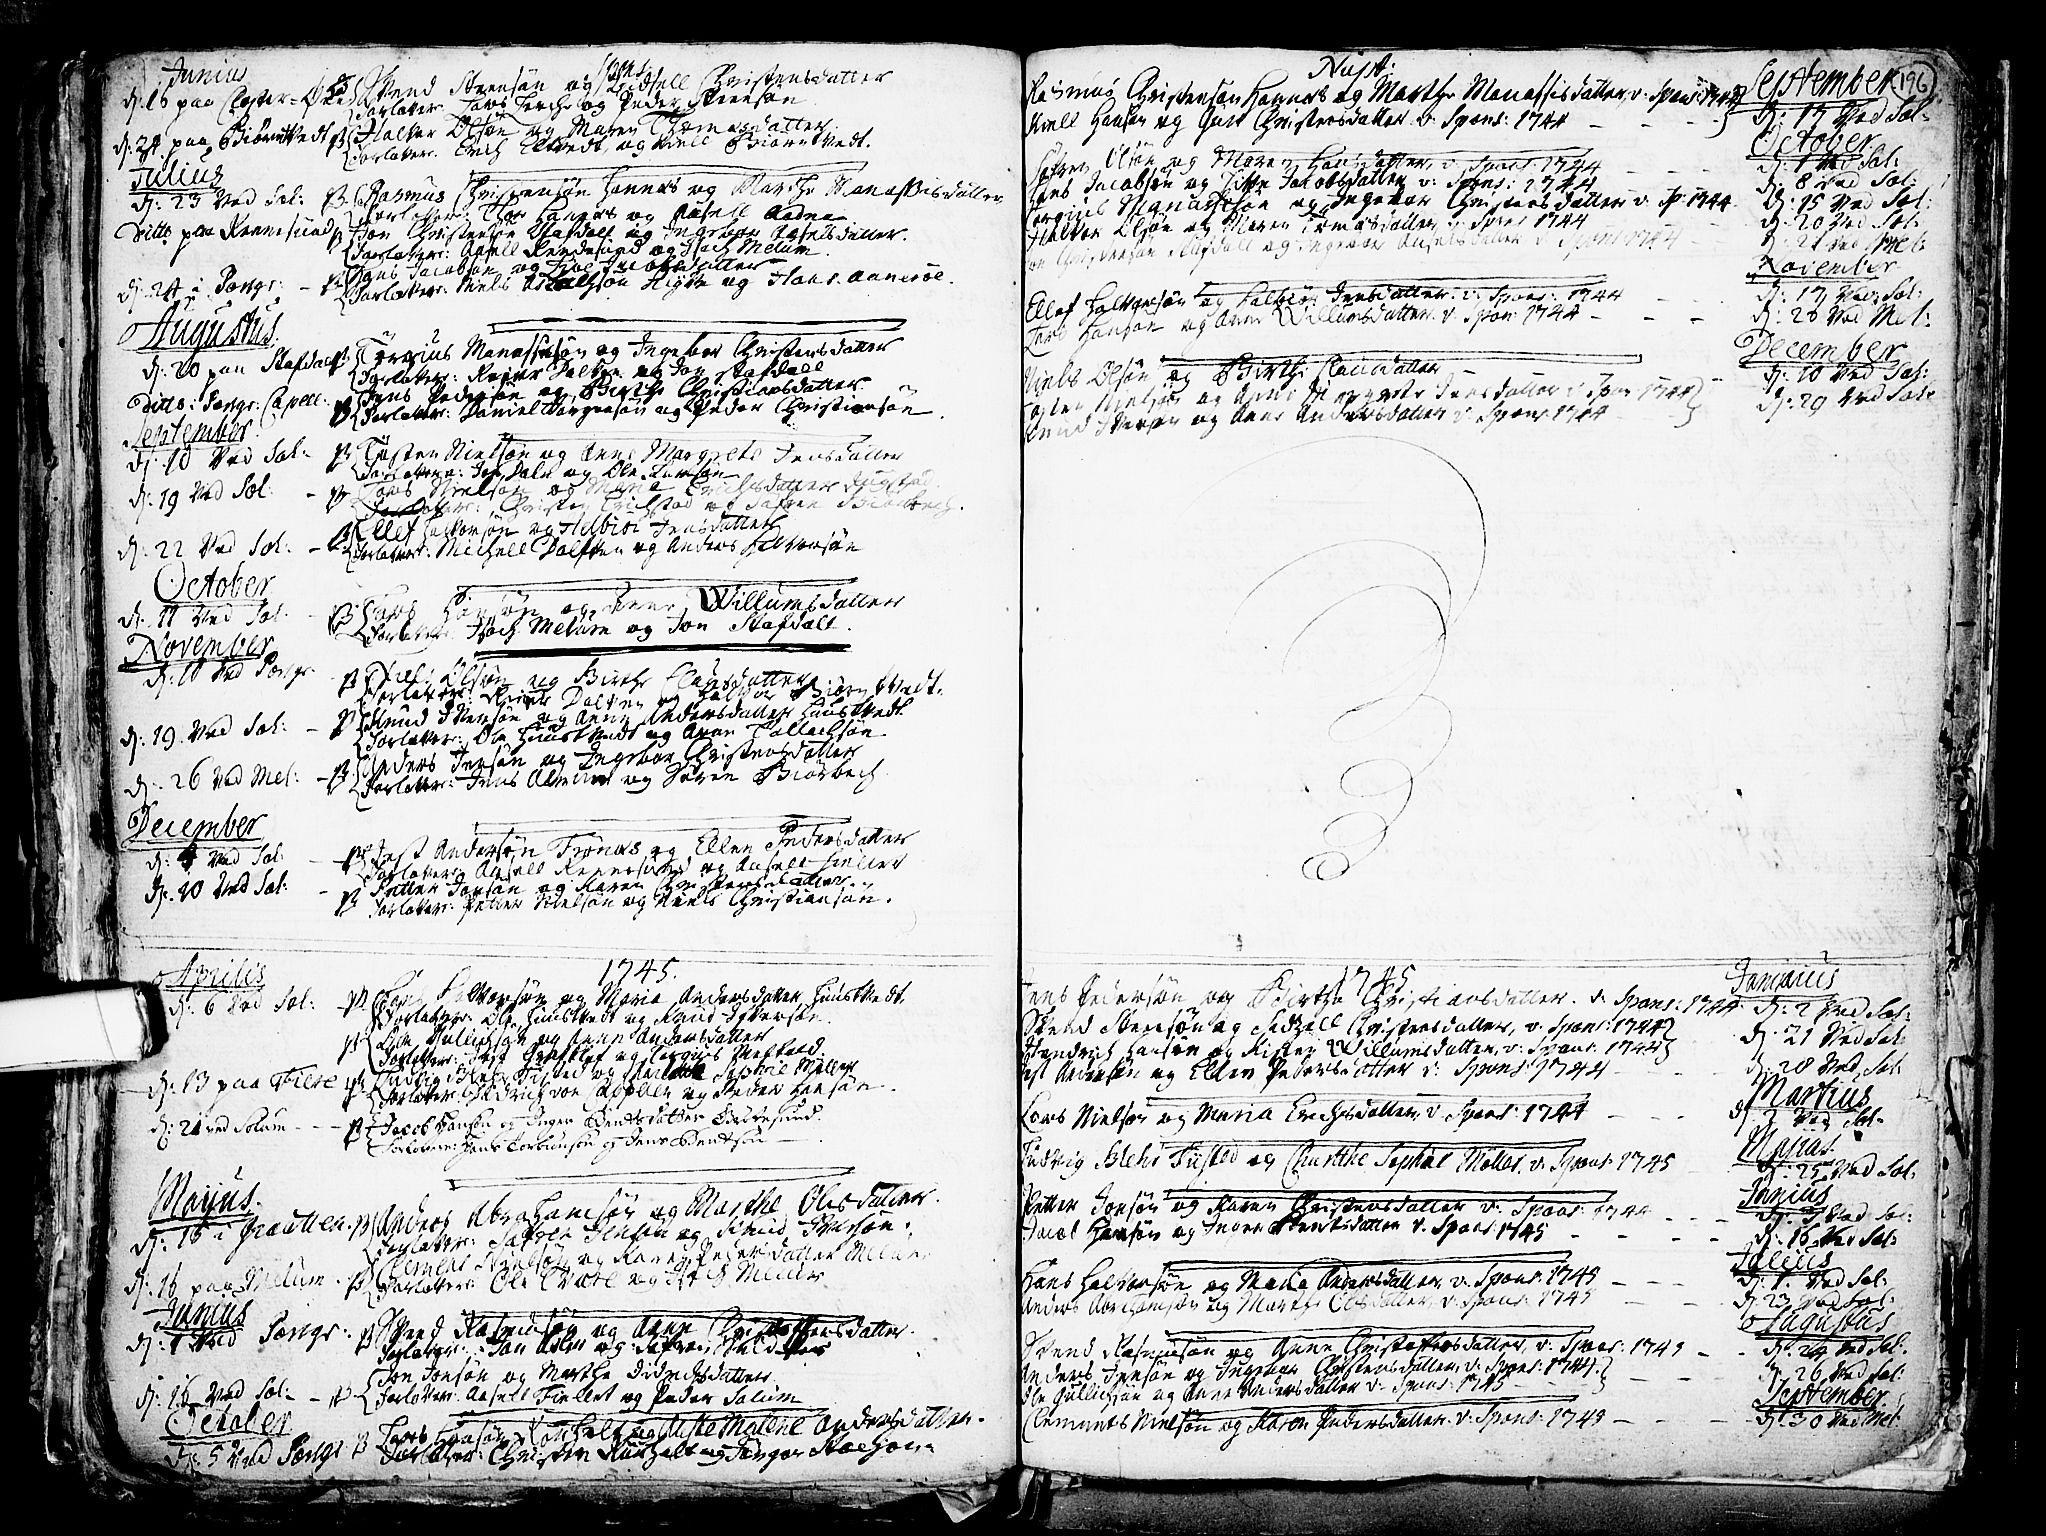 SAKO, Solum kirkebøker, F/Fa/L0002: Ministerialbok nr. I 2, 1713-1761, s. 196